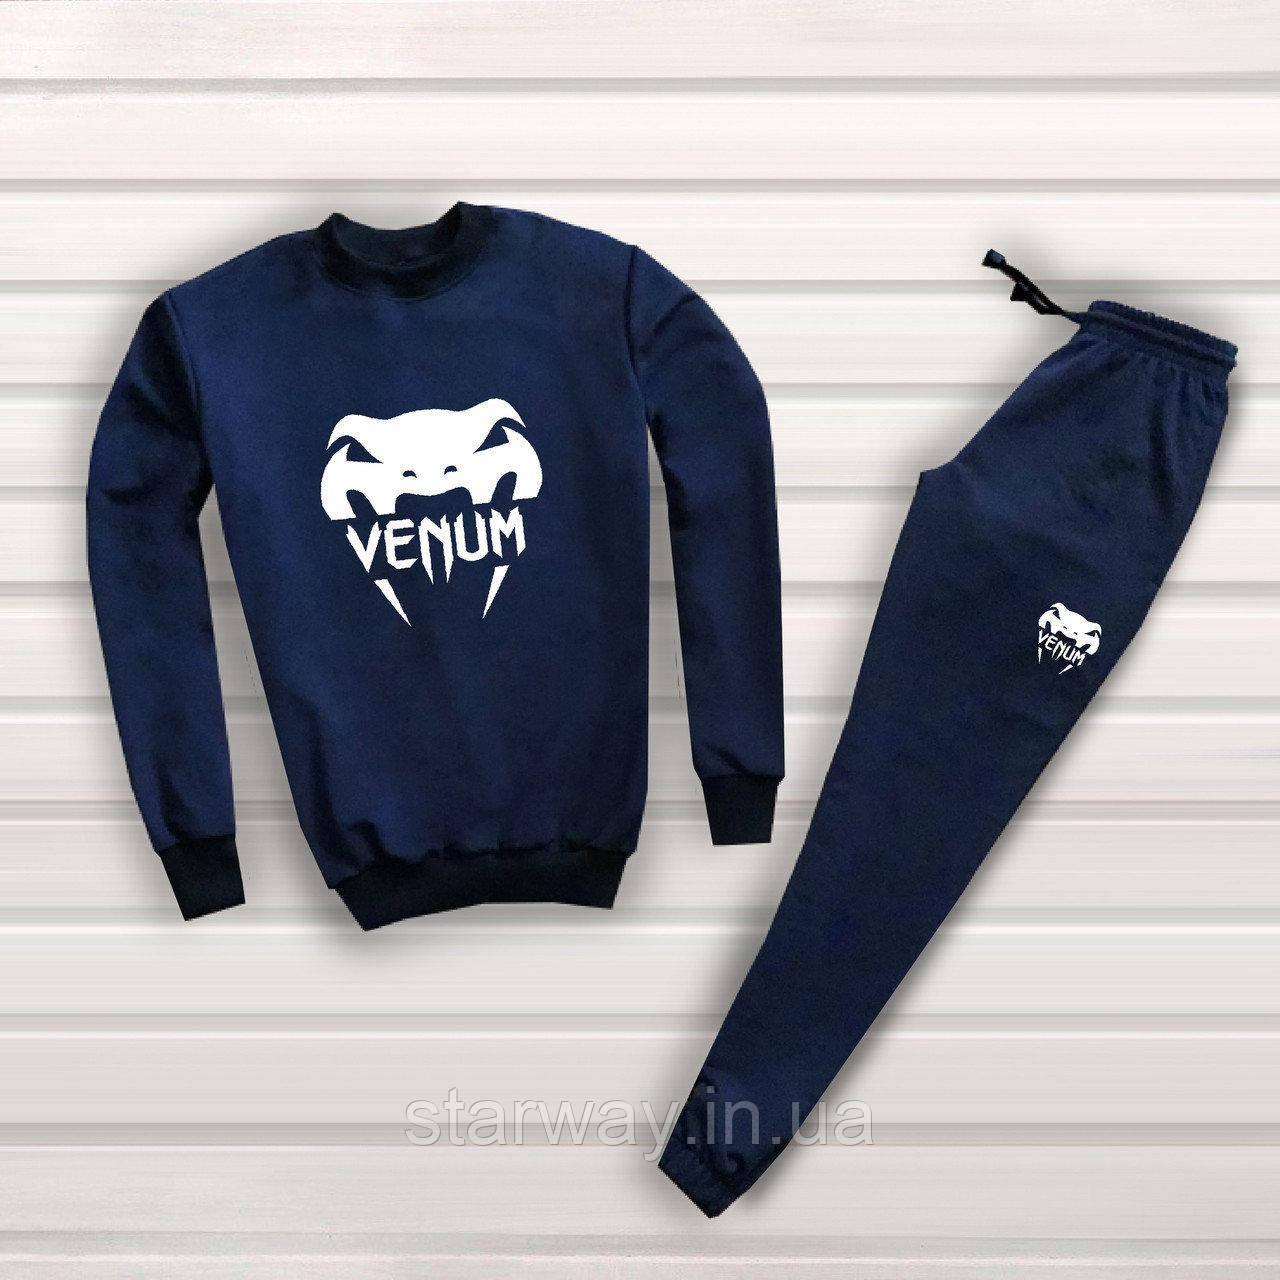 Мужской темно синий спортивный костюм Venum топ | big logо